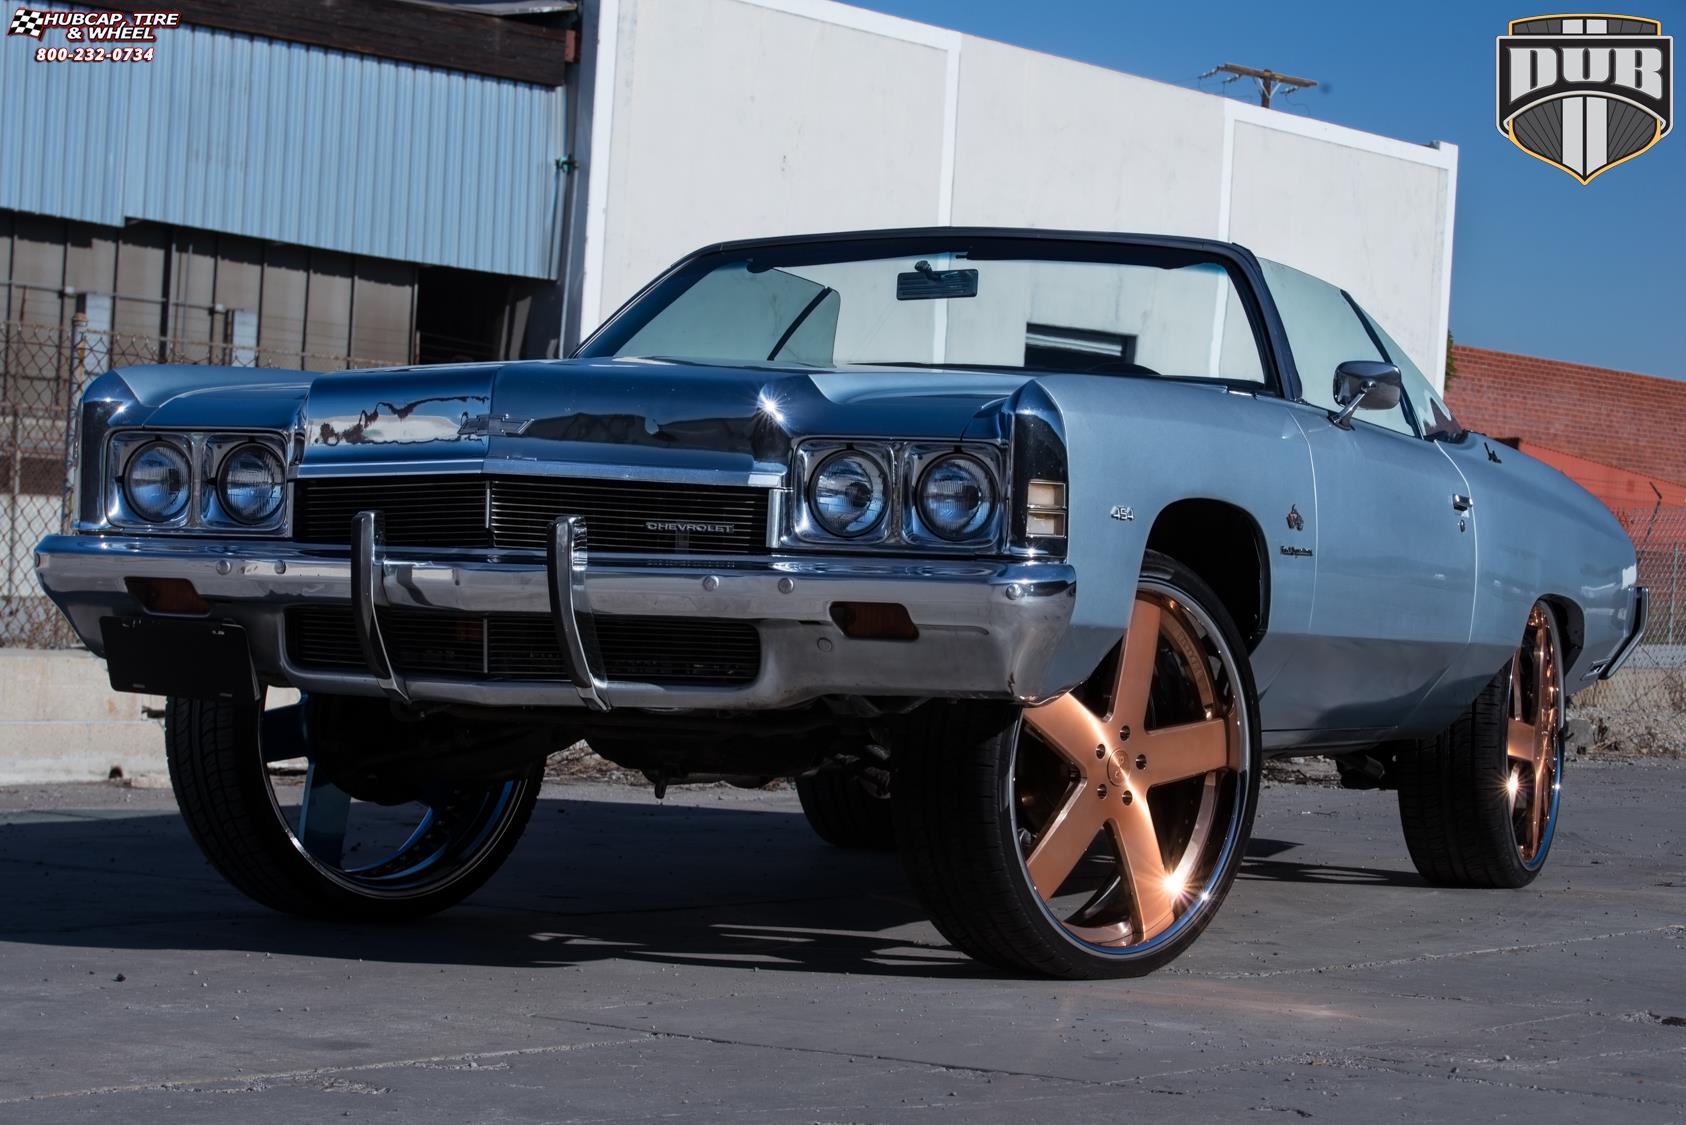 Chevrolet Impala Dub X84 - Baller Wheels Brushed w/ rose gold tint, chrome lip